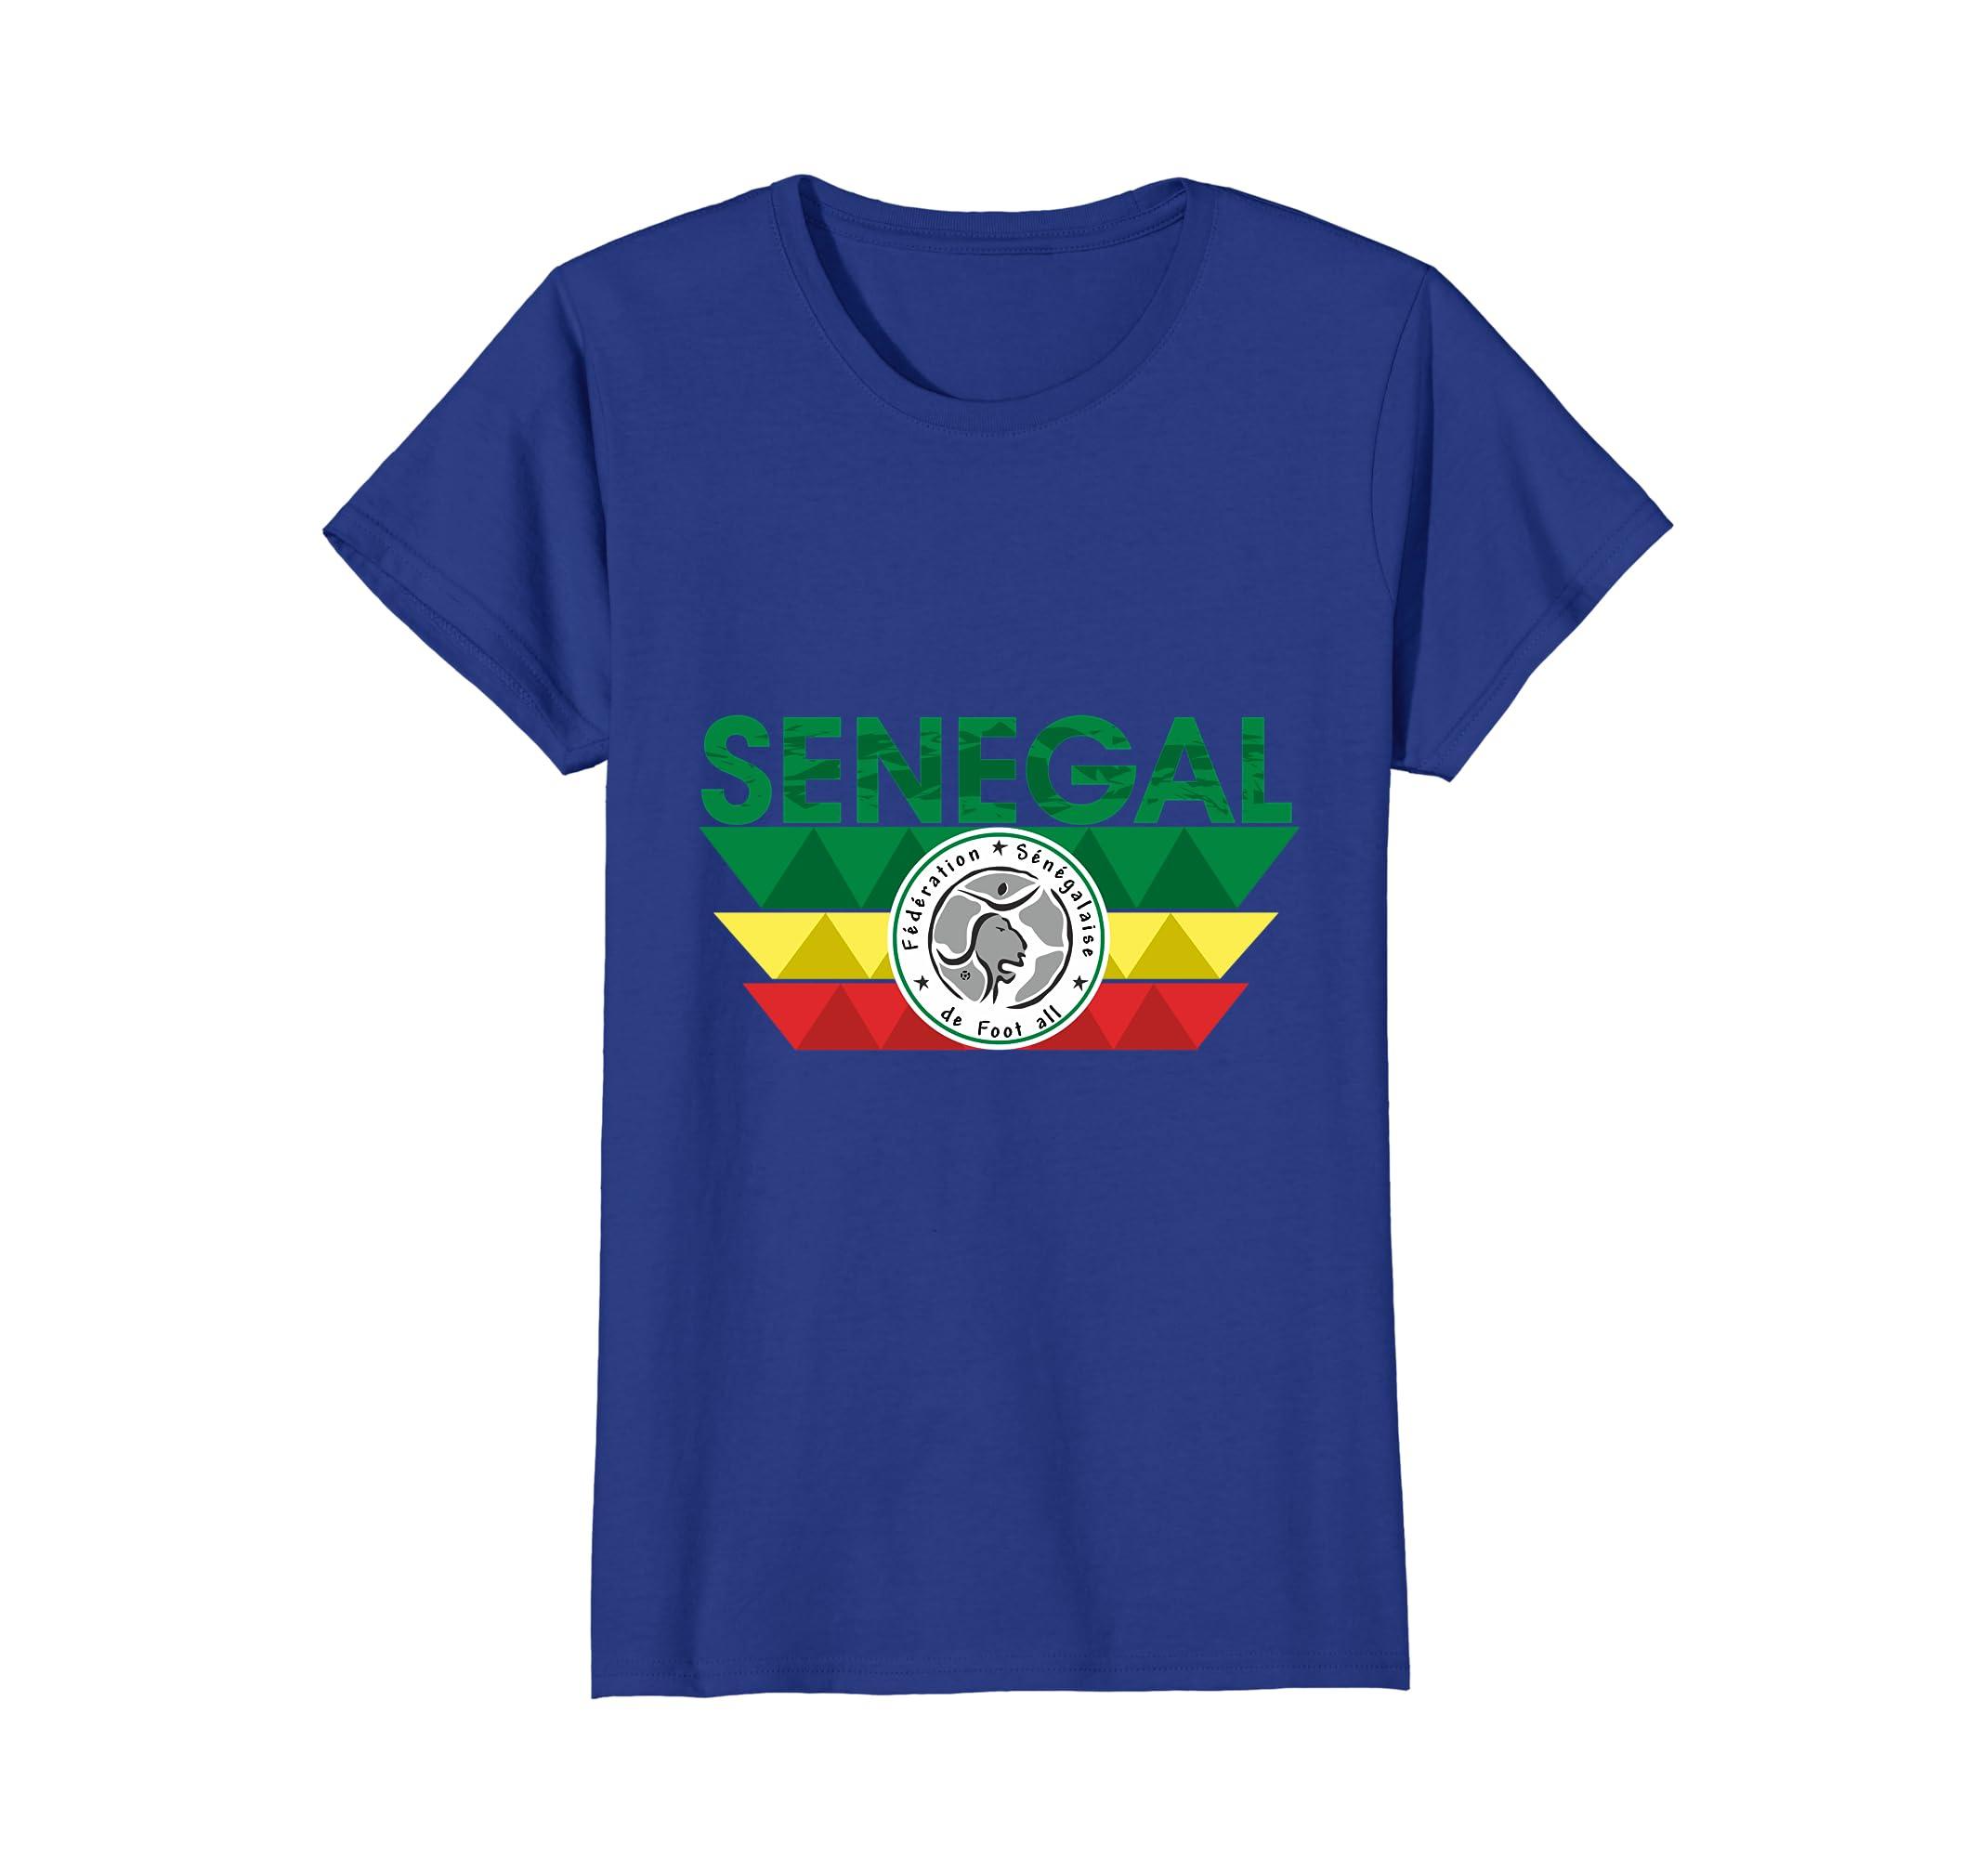 finest selection 5548c 05e6d Amazon.com: Senegal Soccer - Senegalese Football T-shirt ...